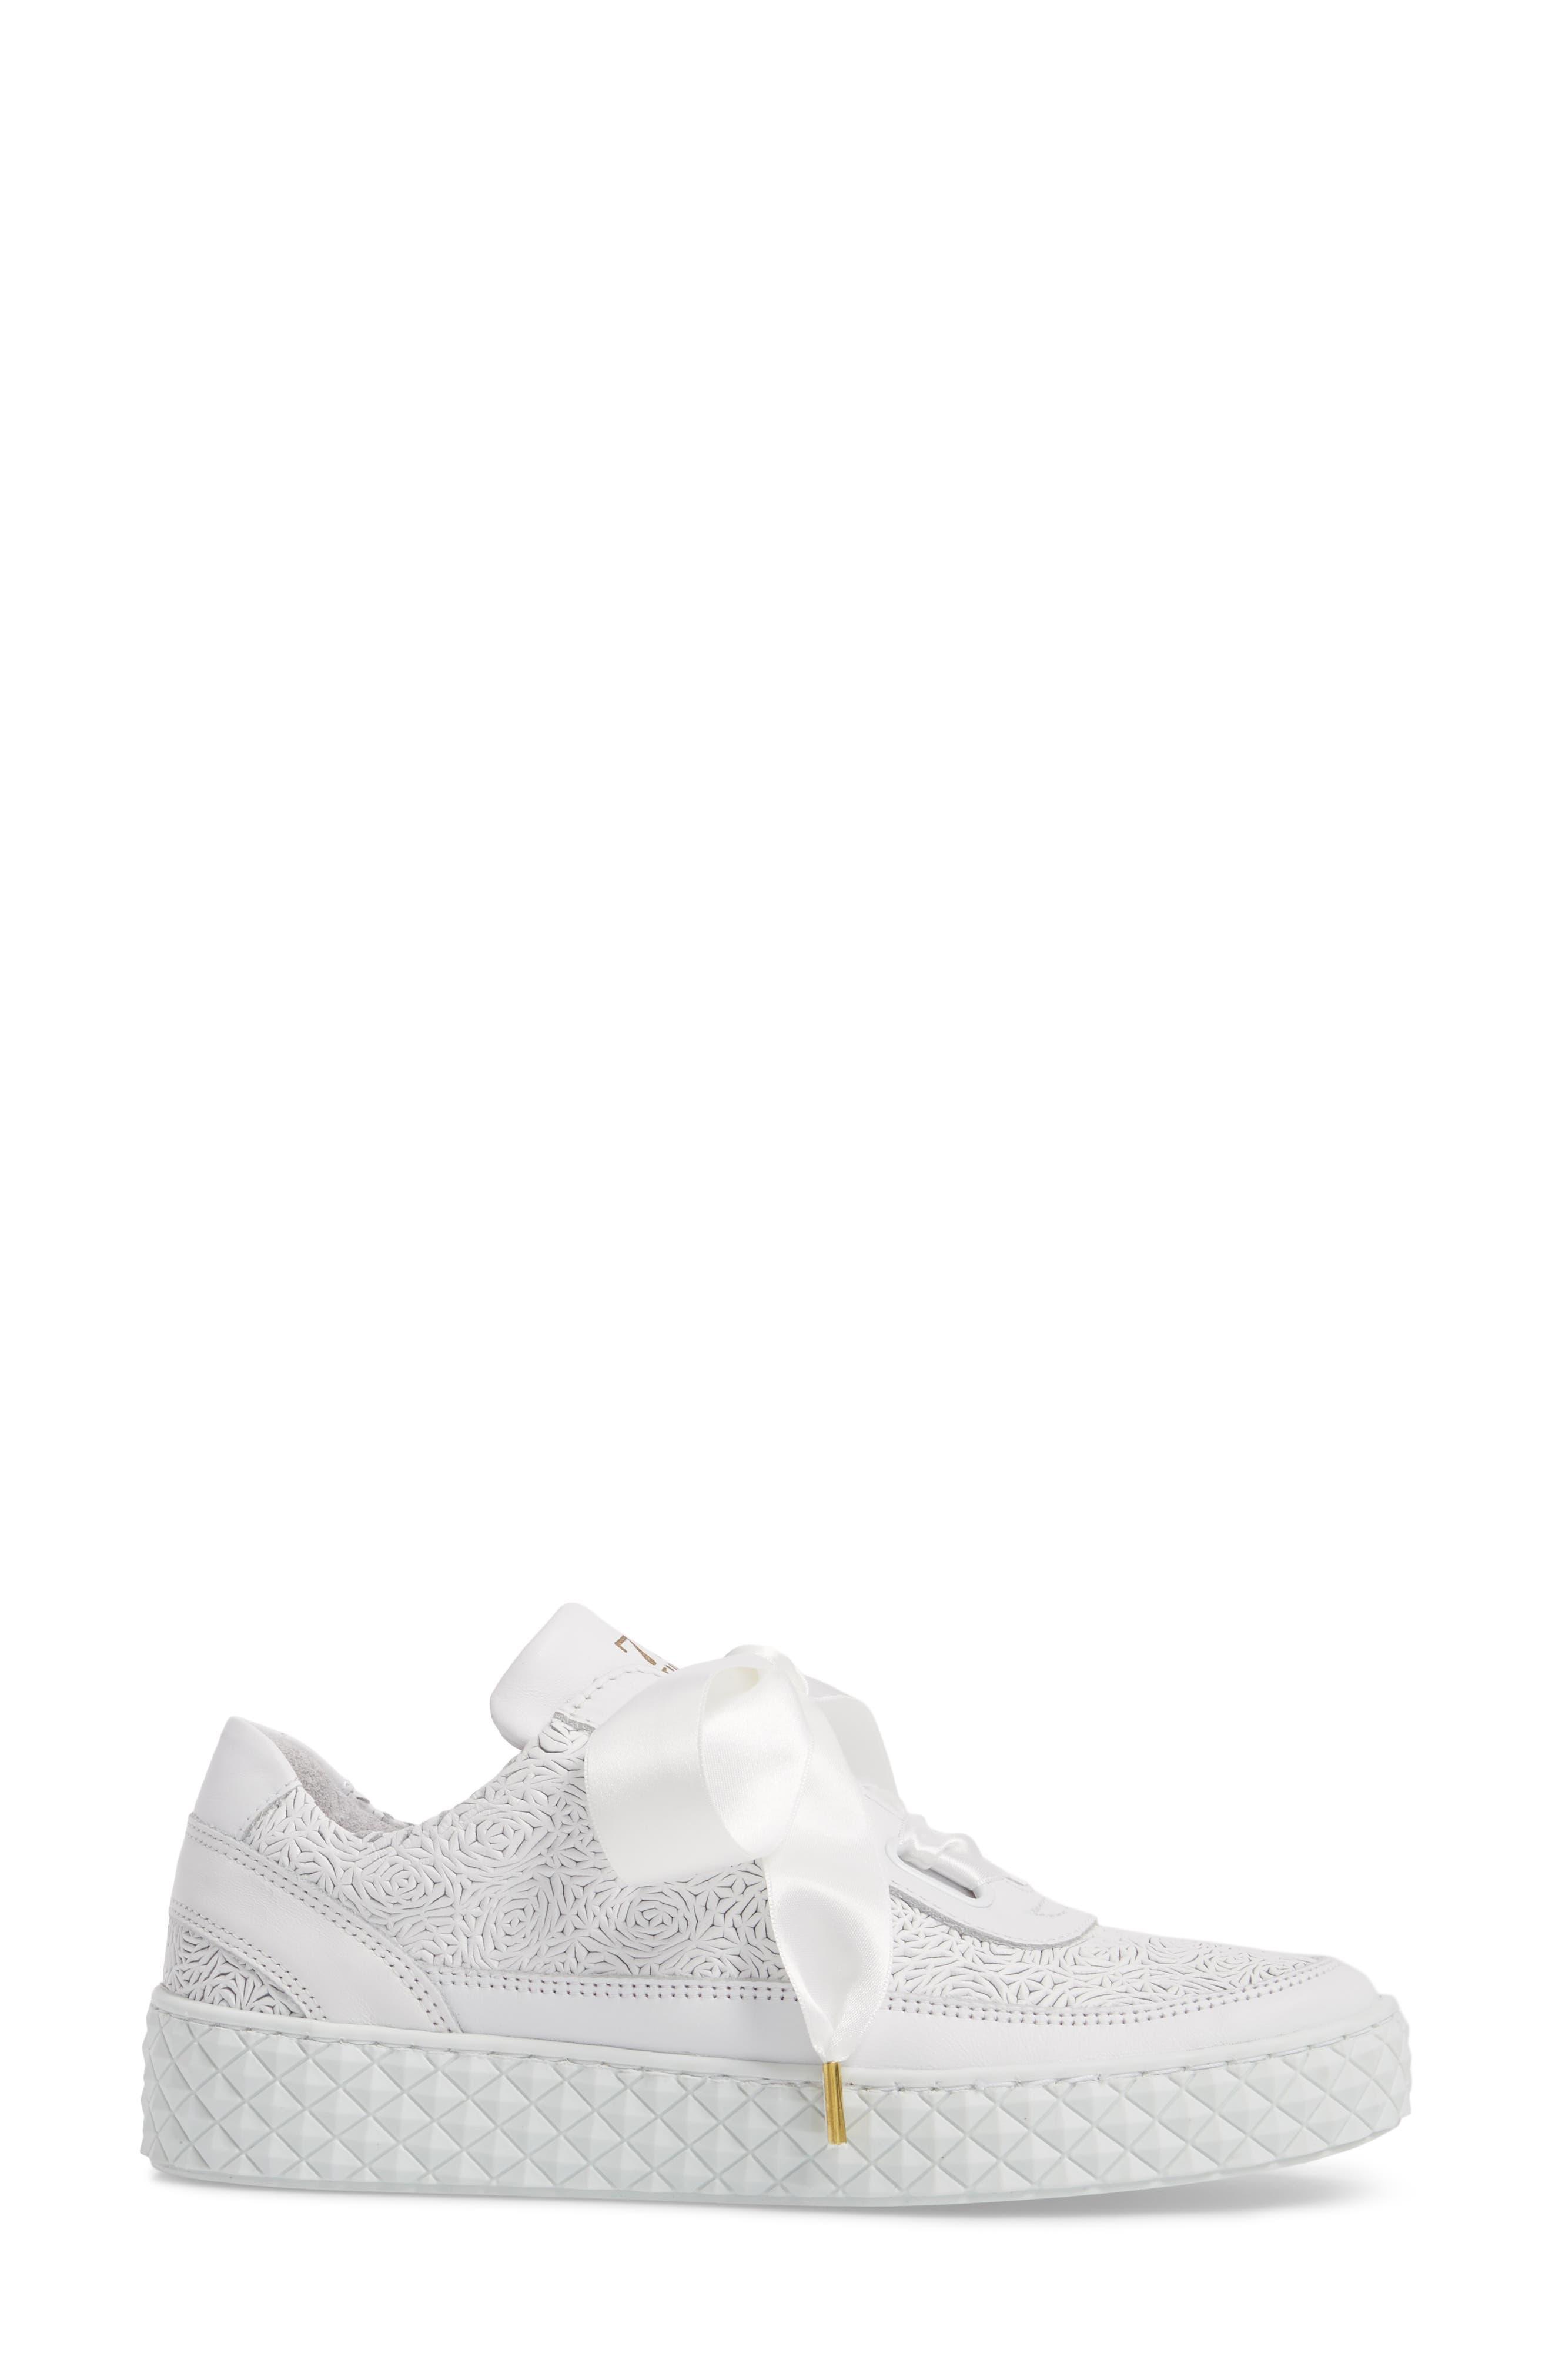 Montreal Sneaker,                             Alternate thumbnail 3, color,                             110